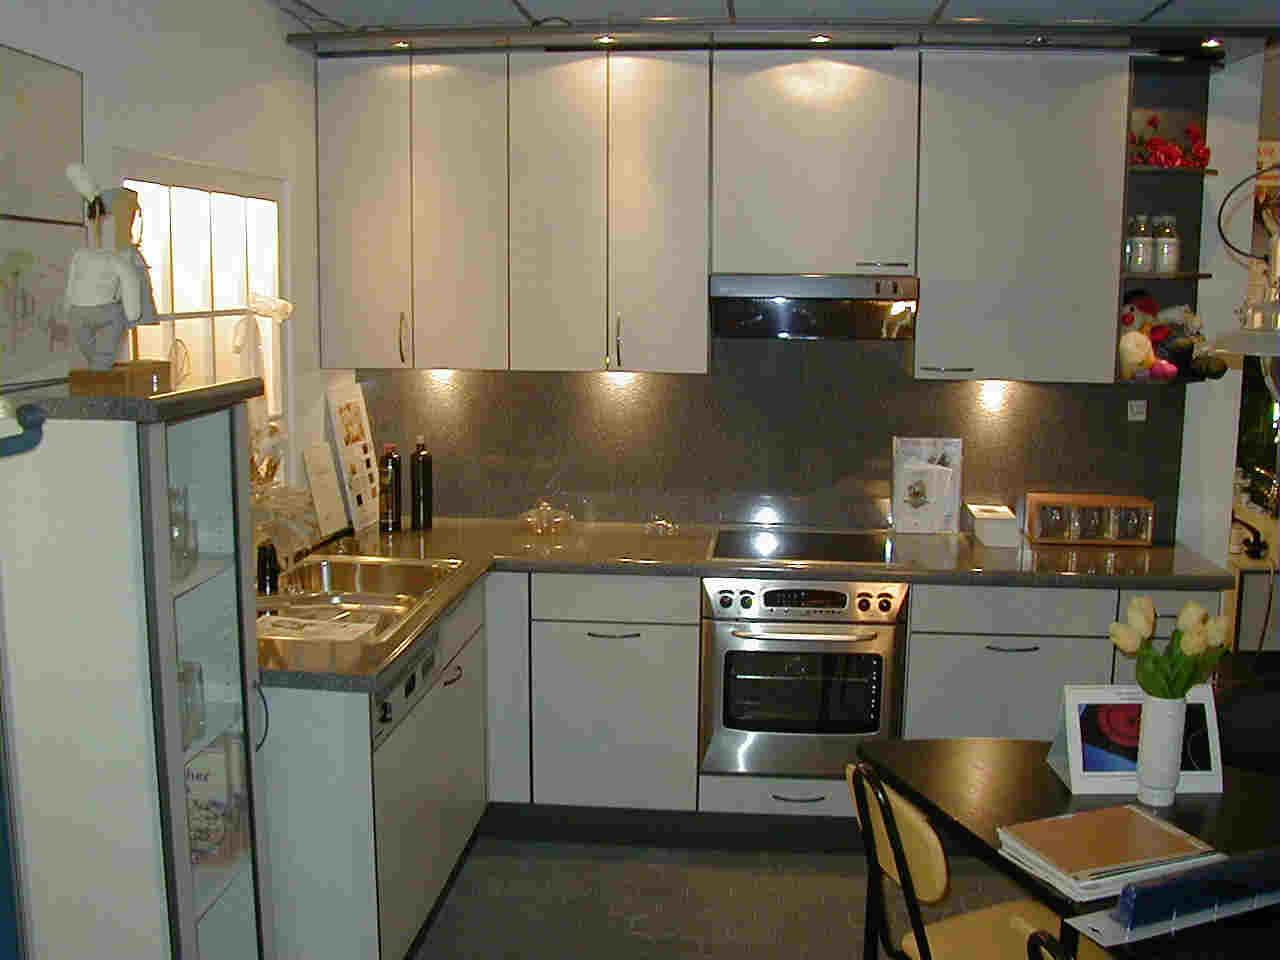 k chenideen k chen abverkauf k chen abverkauf gebraucht k chen musterkuechen. Black Bedroom Furniture Sets. Home Design Ideas